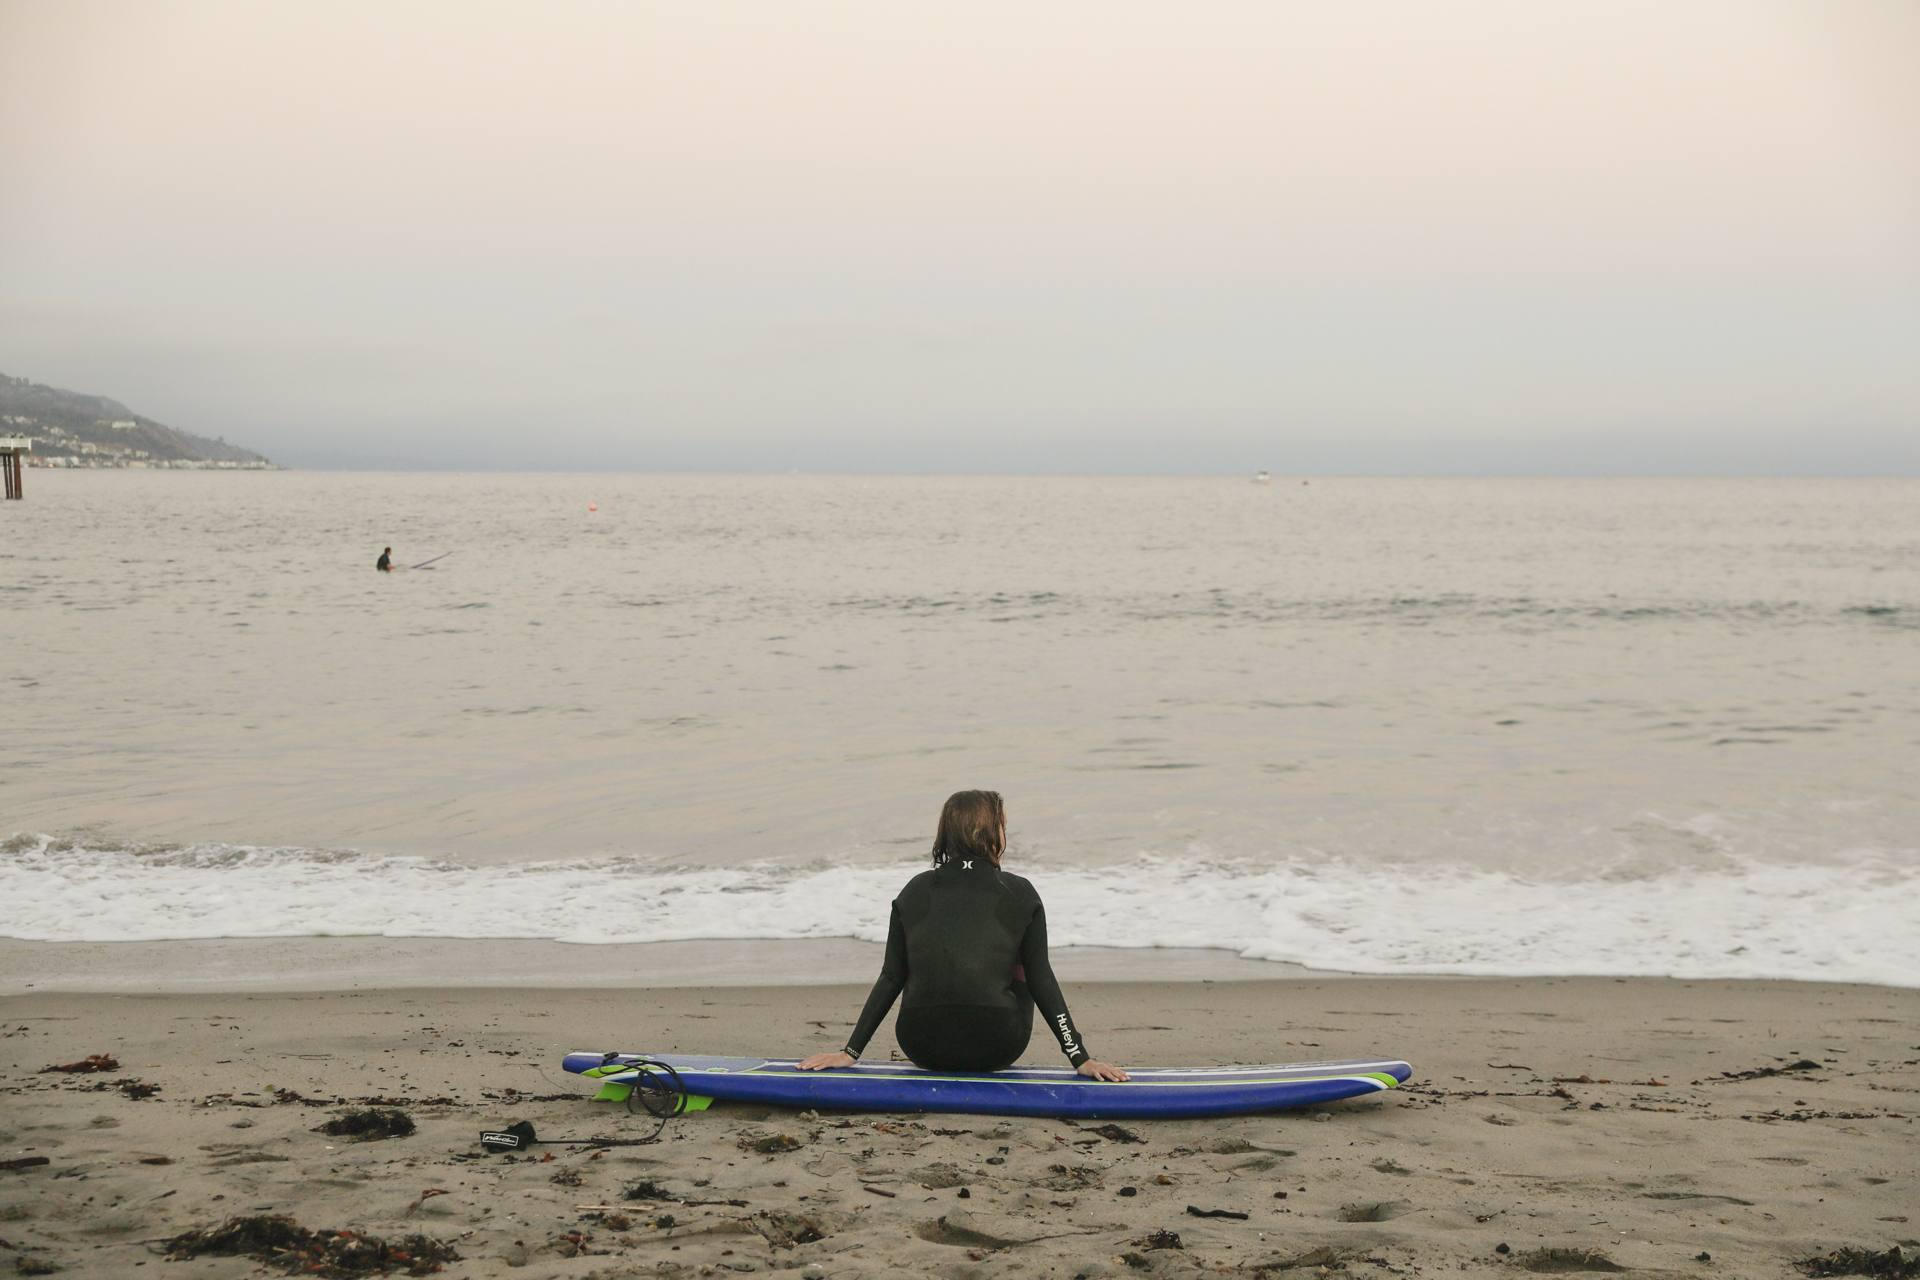 Malibu Surfrider Beach